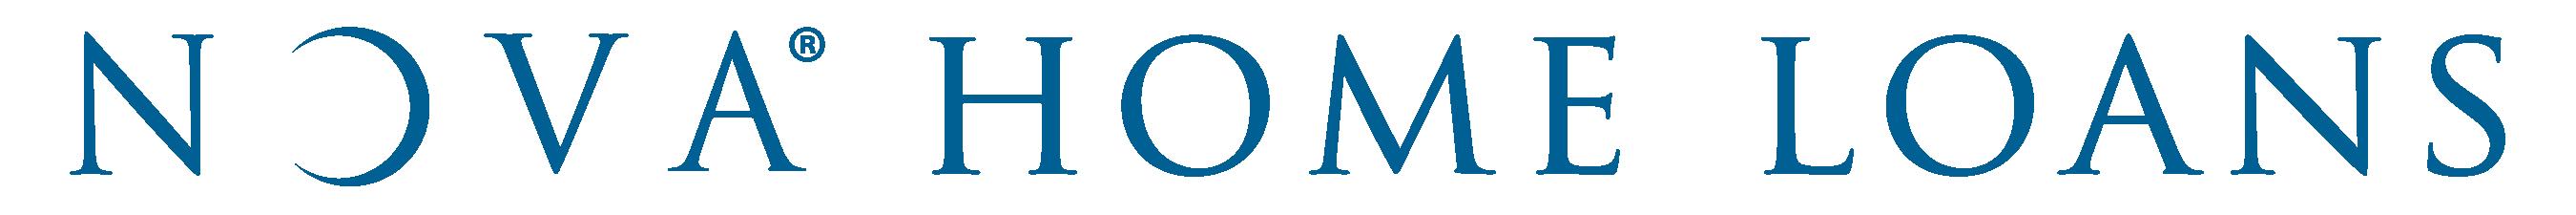 Mortgage Home Loan Company In Az Ca Co Nv And Tx Nova Home Loans